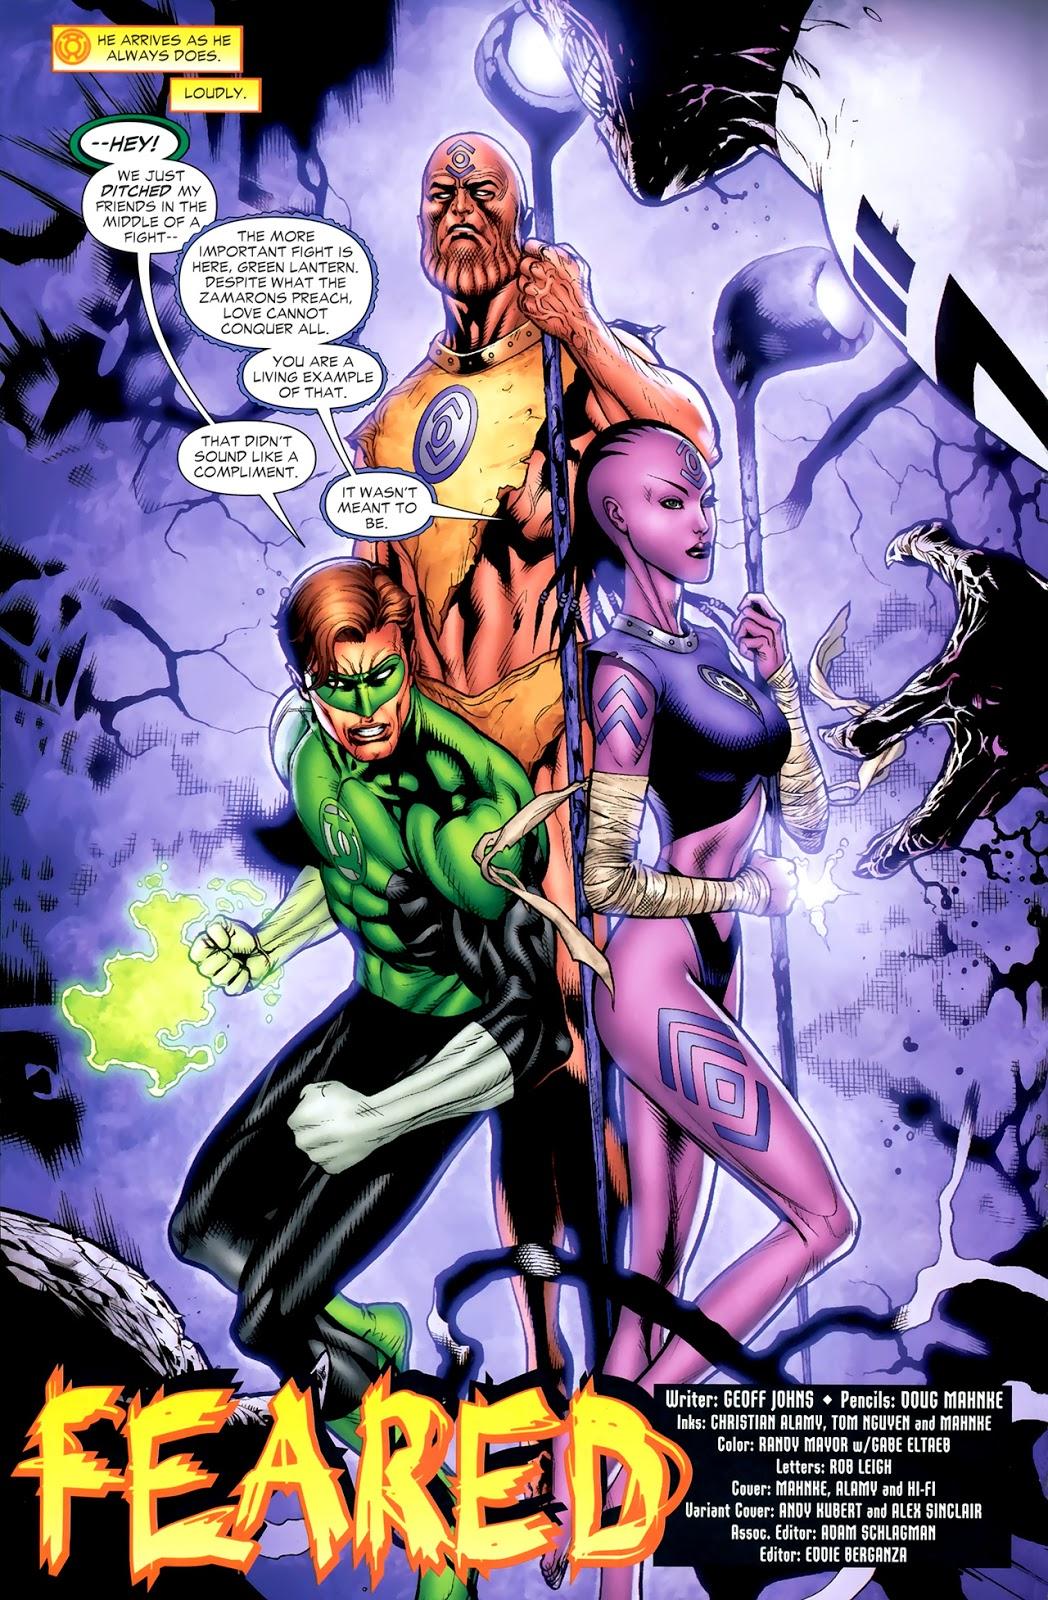 Hal Jordan And The Indigo Tribe (Green Lantern Vol. 4 #46)